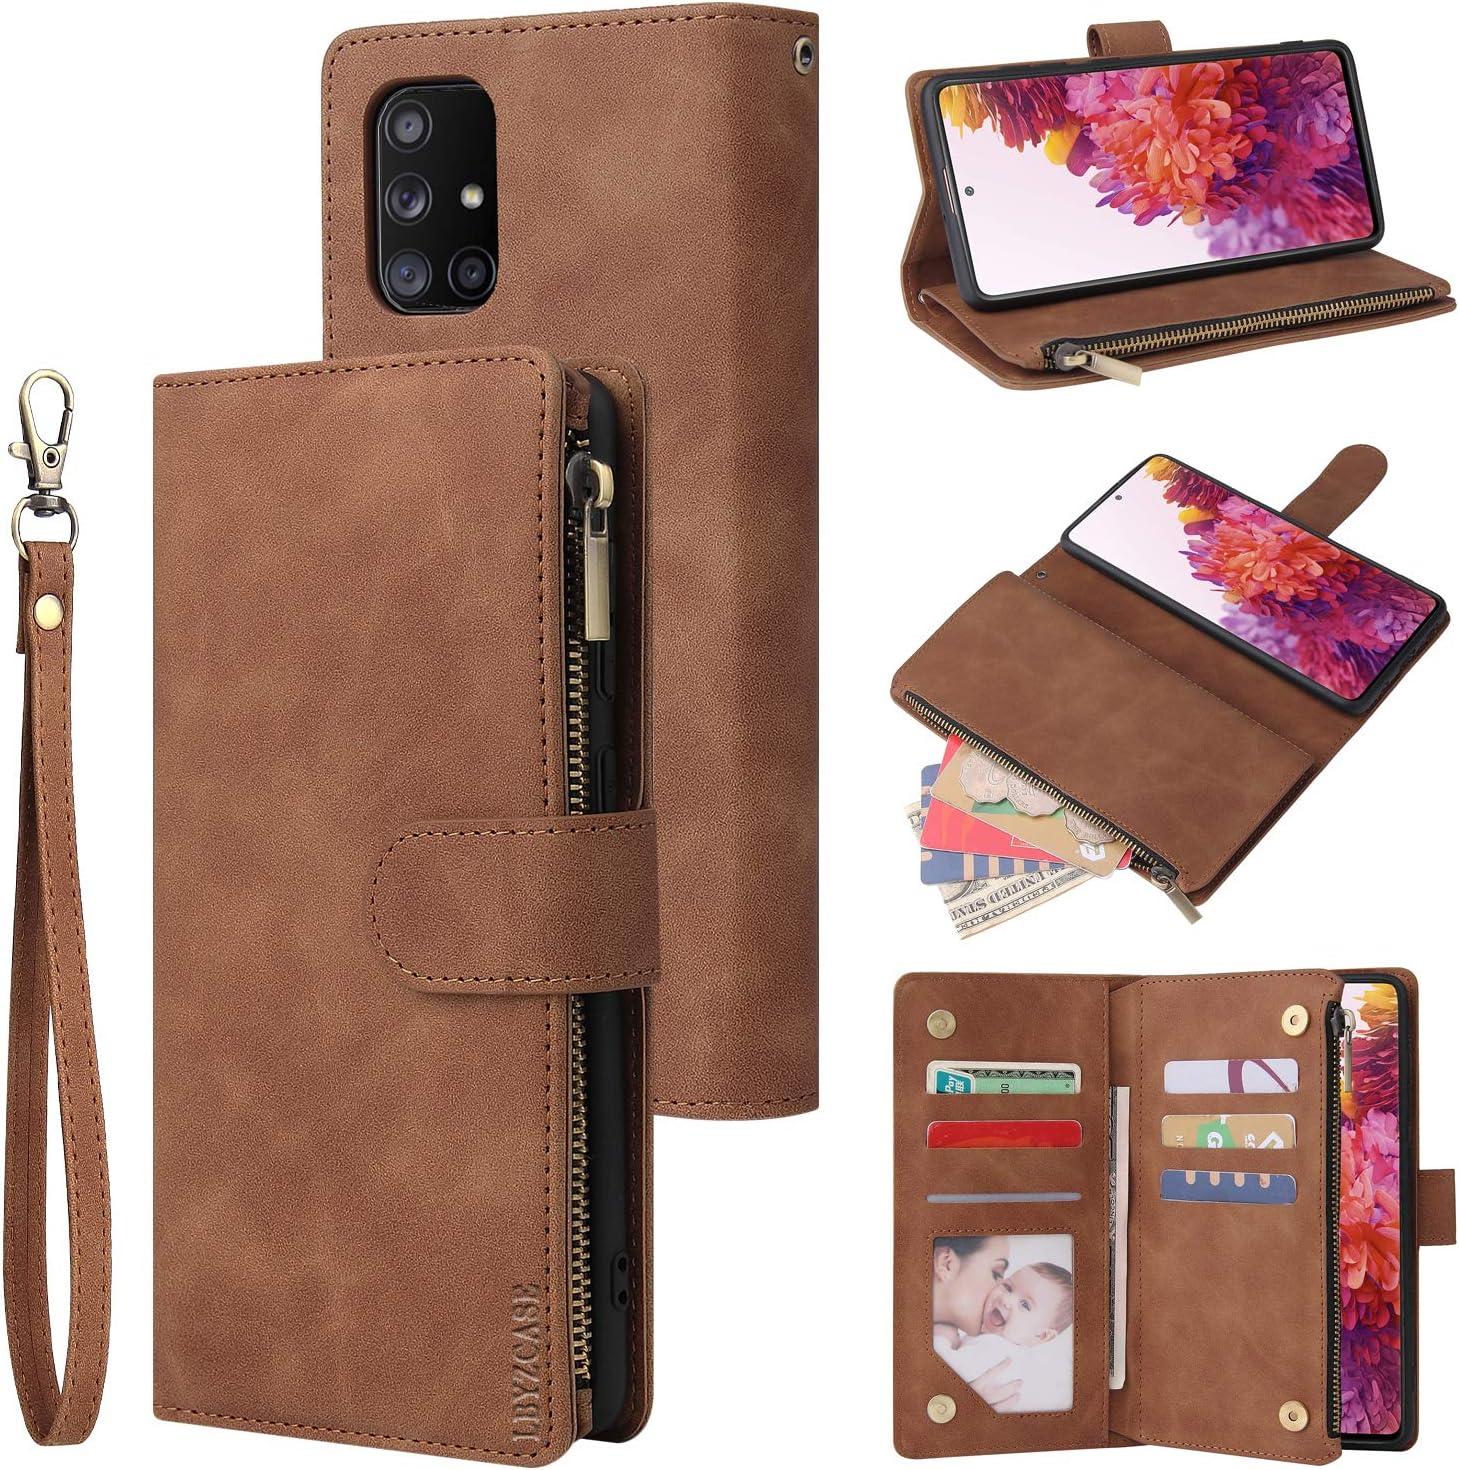 for Samsung Galaxy S20 FE 5G Wrist Strap -Brown 2020 ,Samsung S20 FE Wallet Case,Luxury Folio Flip Leather Cover LBYZCASE Phone Case for Galaxy S20 FE 5G Fan Edition Kickstand Zipper Pocket